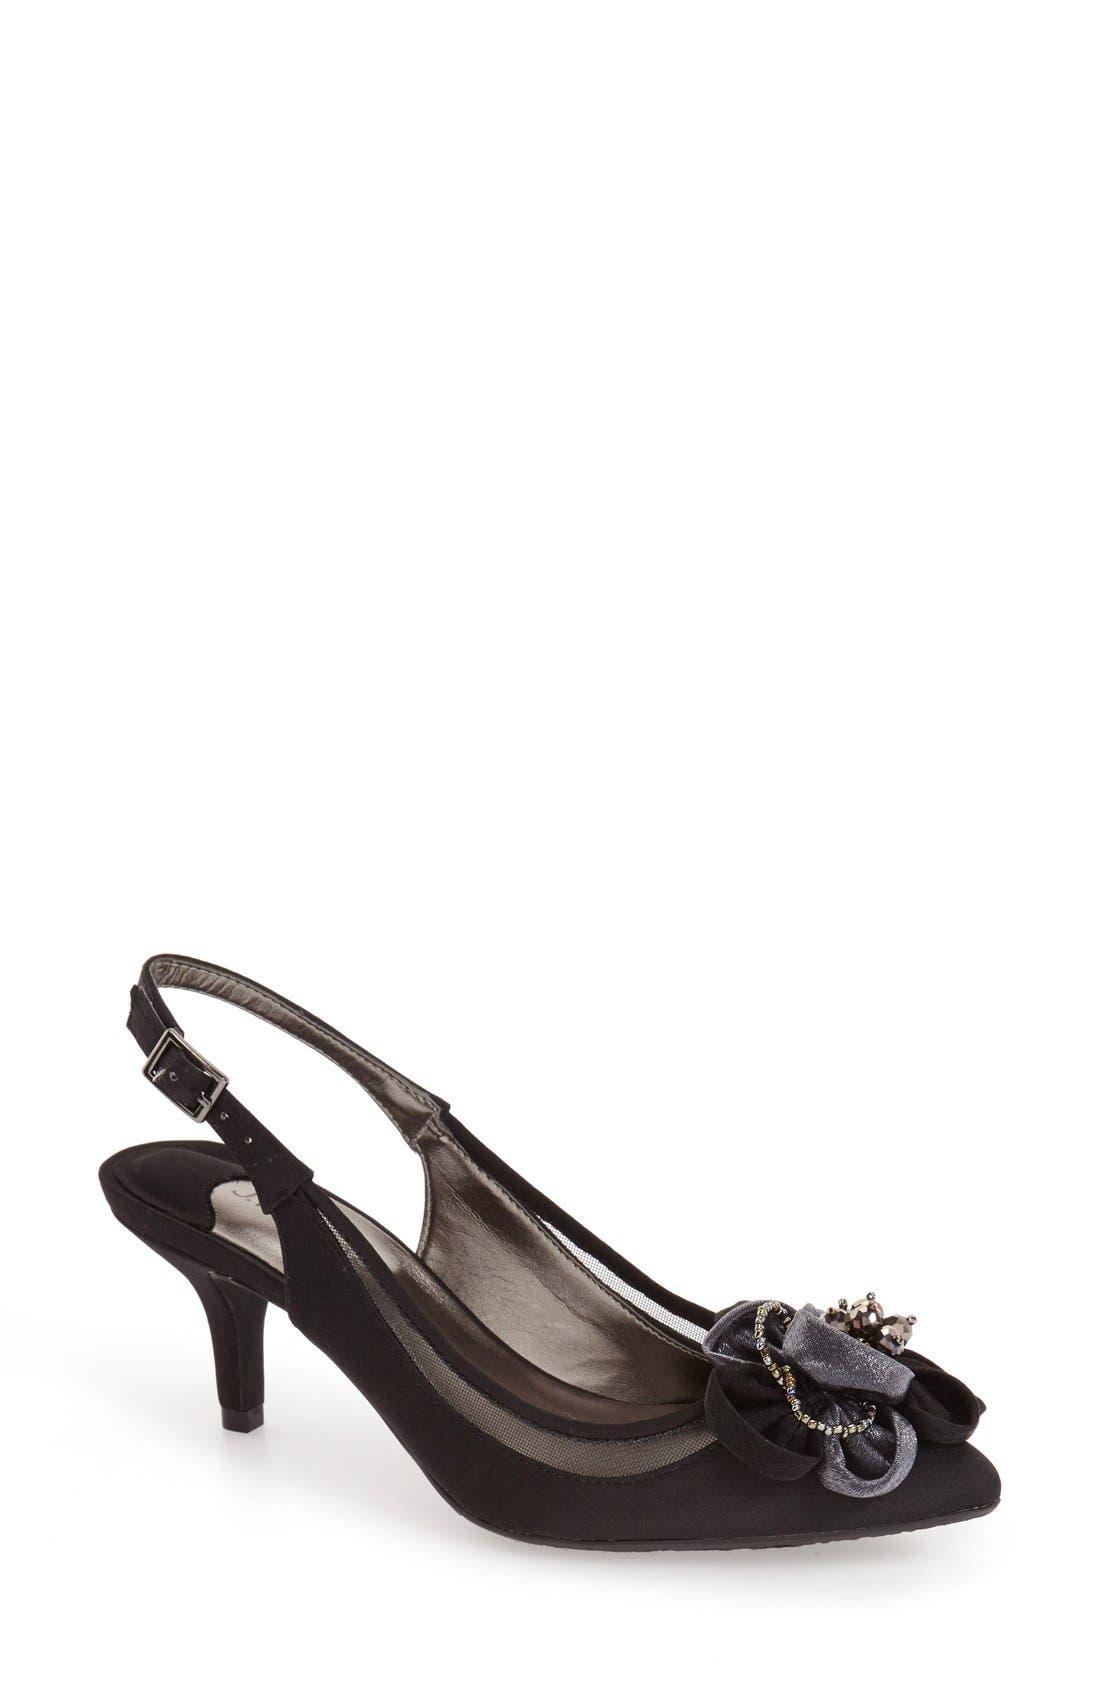 'Adderly' Kitten Heel Slingback Pointy Toe Pump,                         Main,                         color, 001